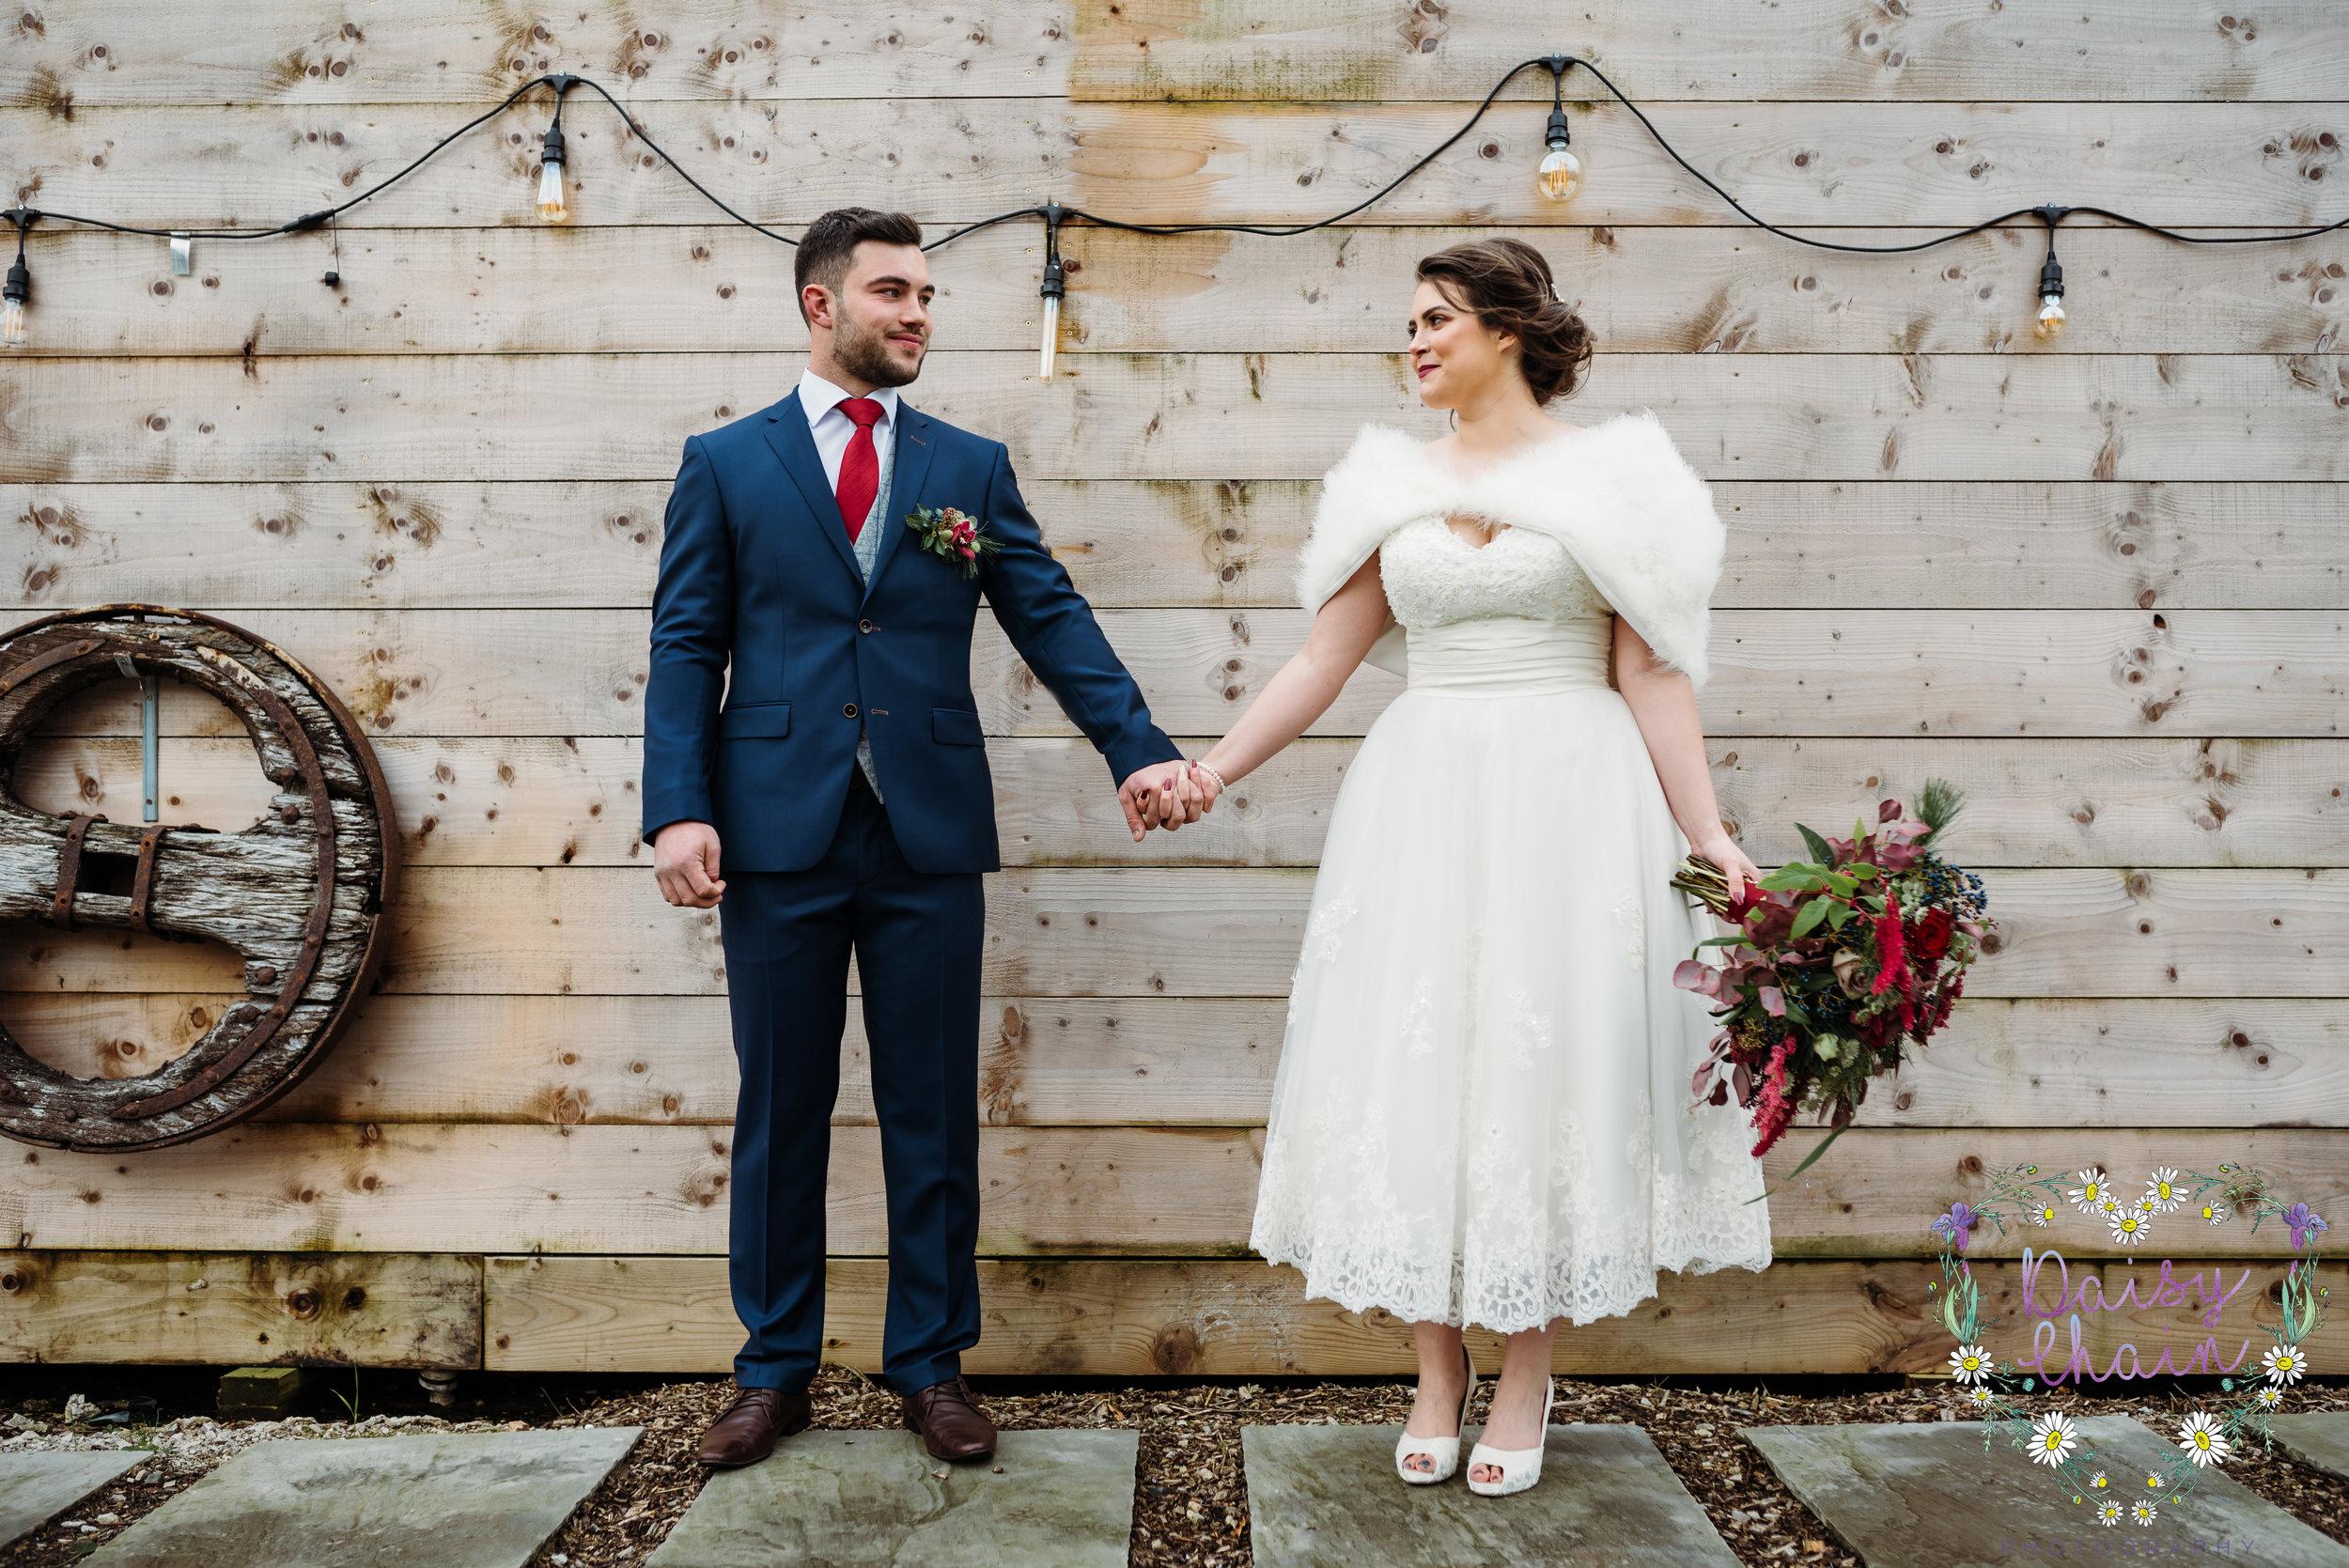 Bashall Barn  - rustic wedding